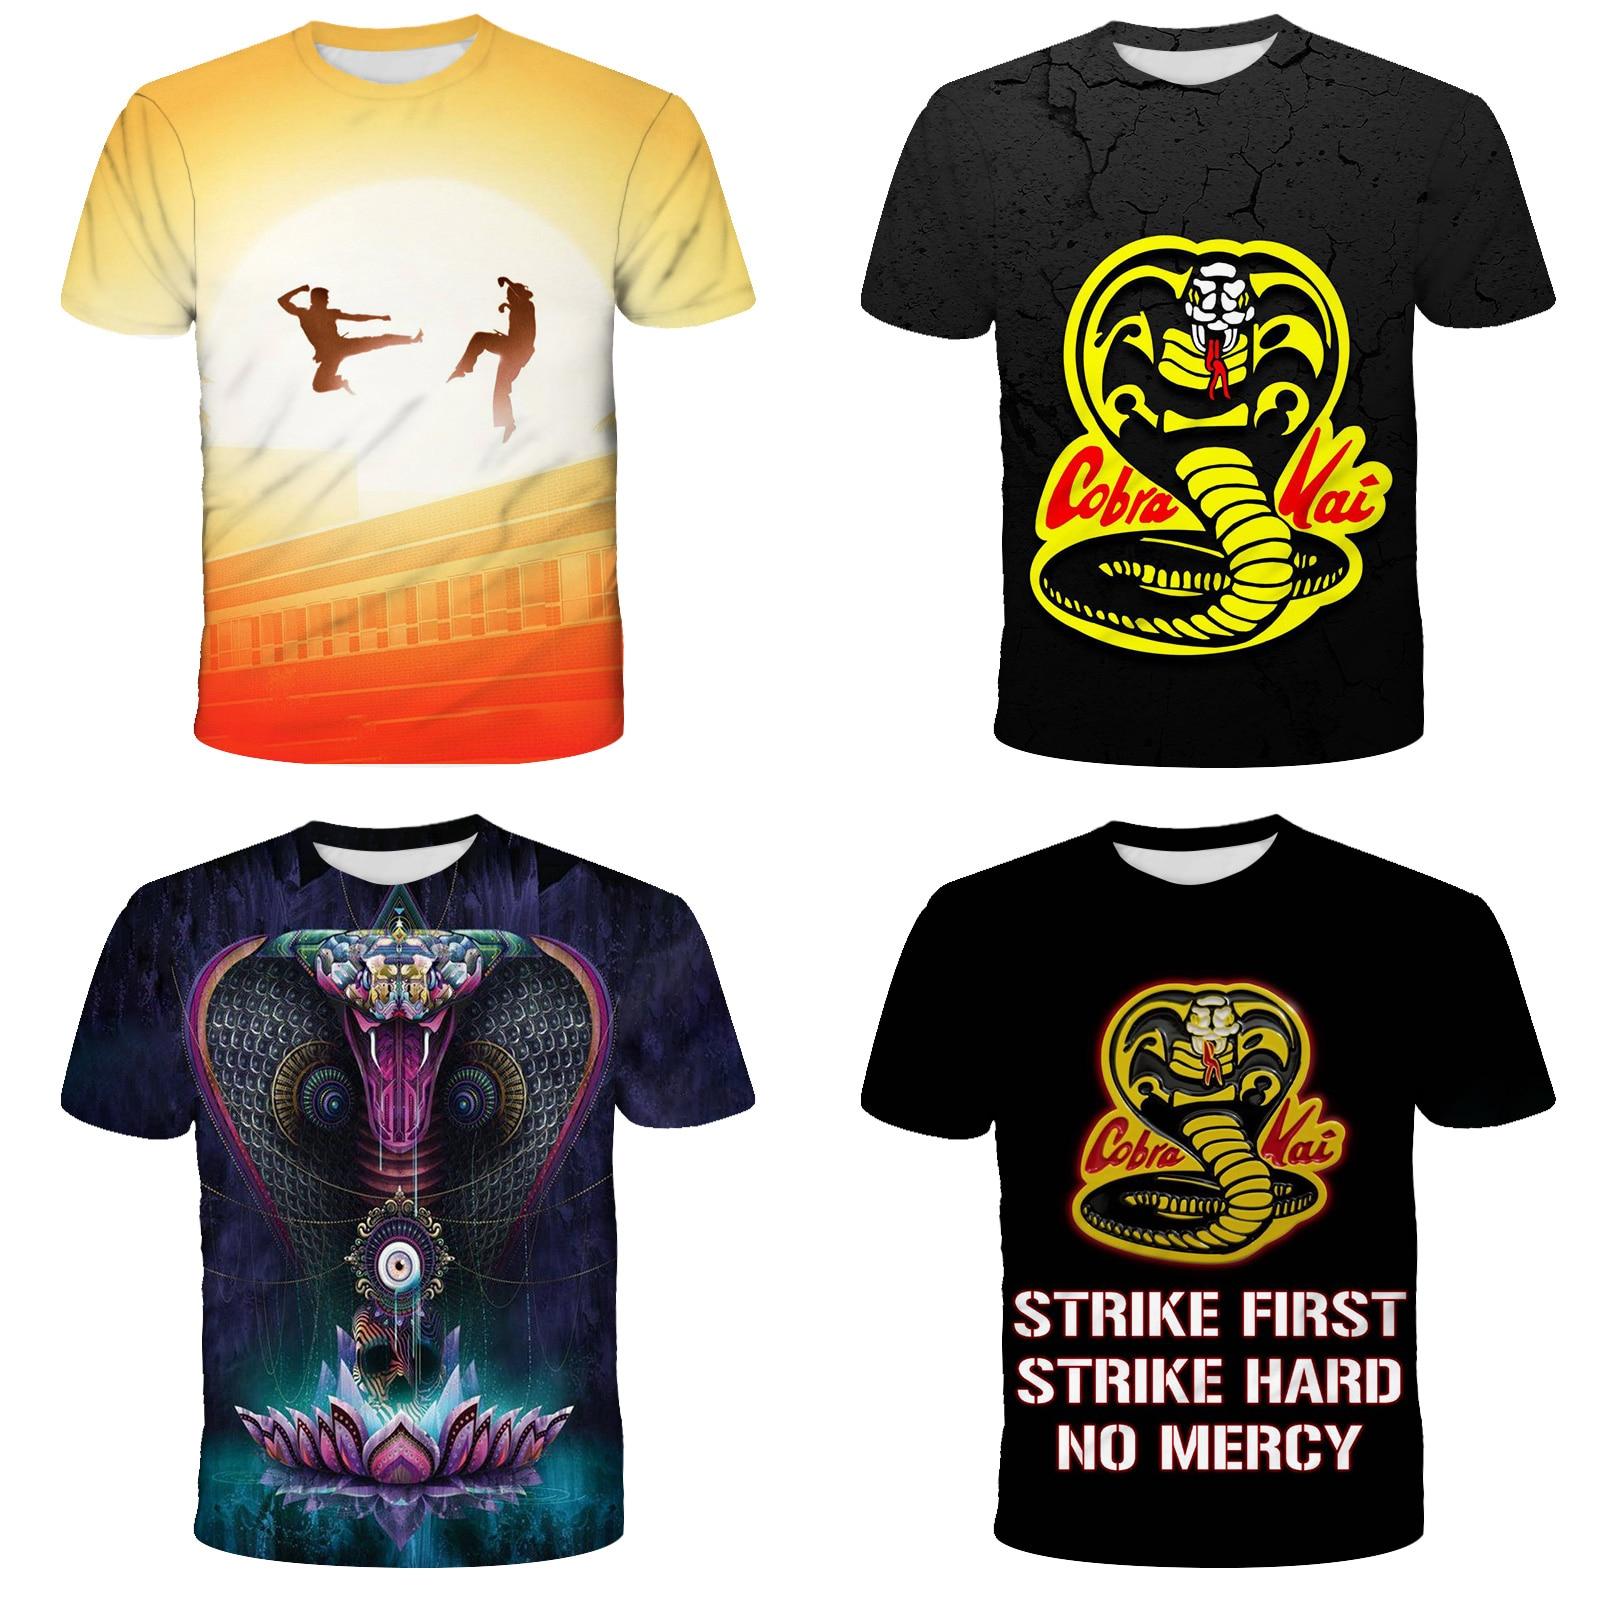 Cobra Kai T Shirt Boys Avatar Tshirt Girs Summer Top Tshirts Short Sleeves Tees Black kids T-Shirt Clothes Girl 10 Years